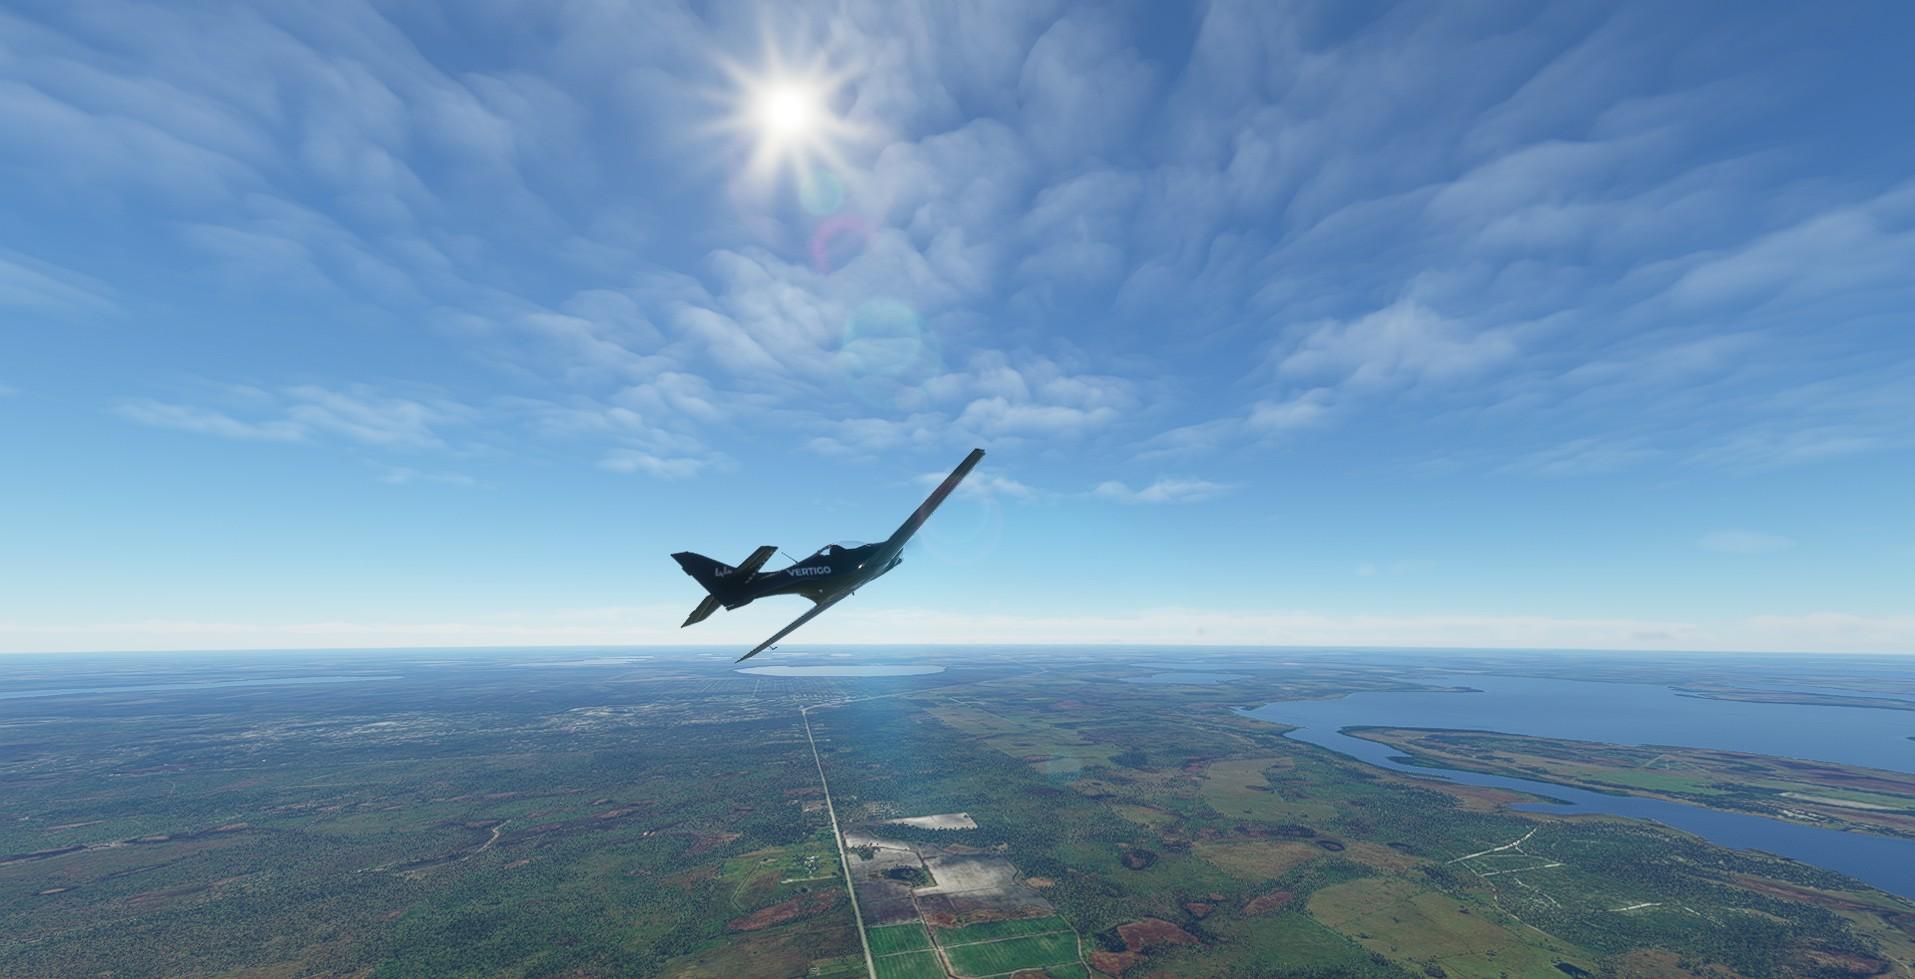 Microsoft Flight Simulator 5 9 2021 4 41 25 Pm